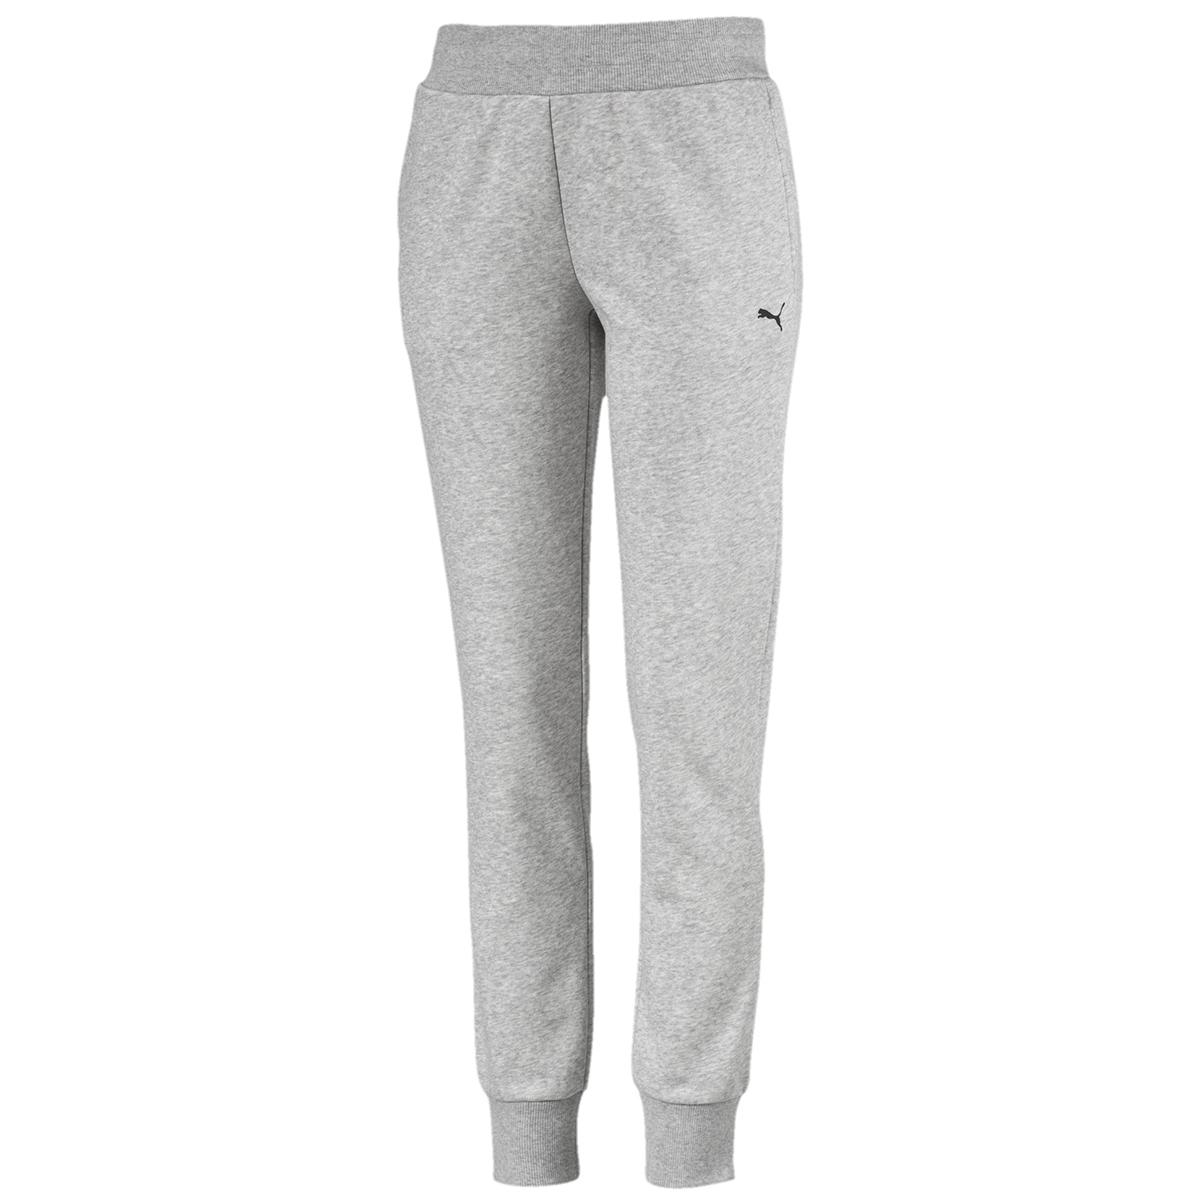 Puma Women's Essential Fleece Sweatpants - Black, S